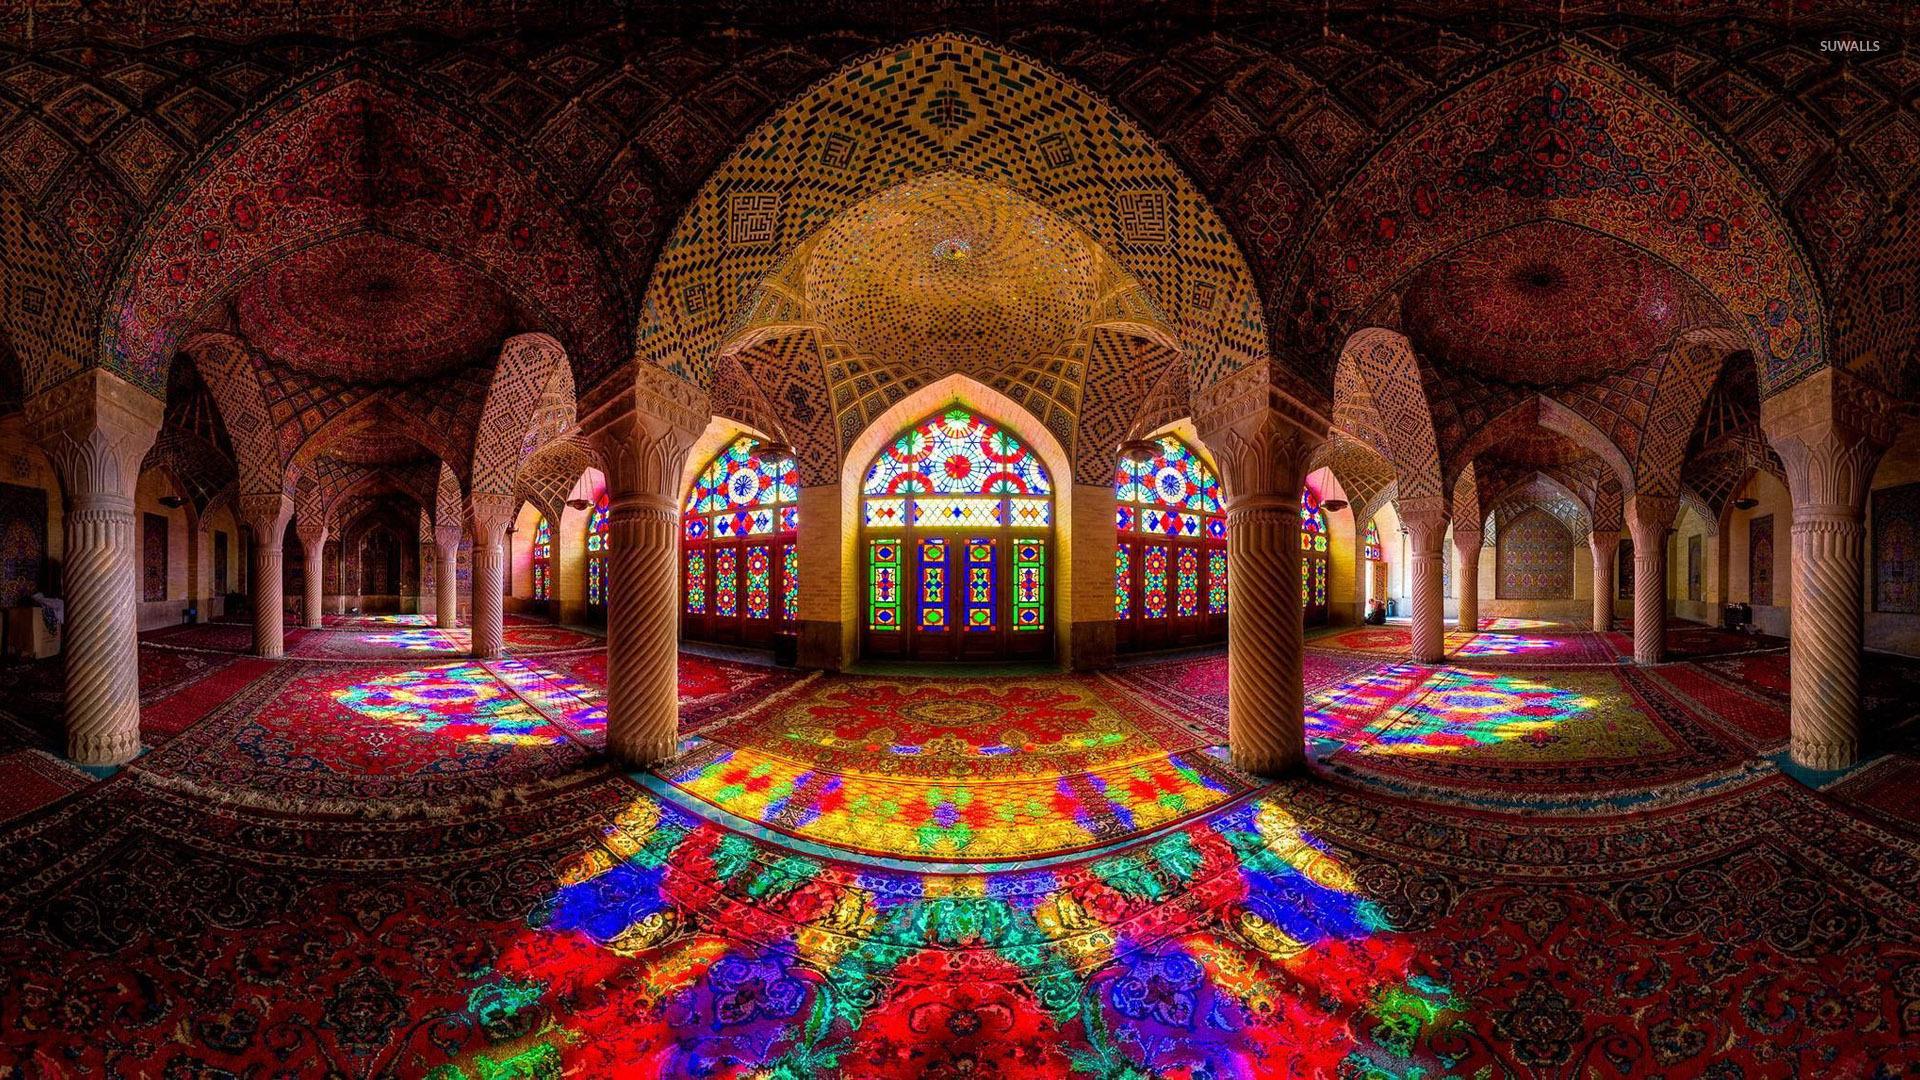 Nasir al-Mulk Mosque, Iran wallpaper - Photography wallpapers - #29013